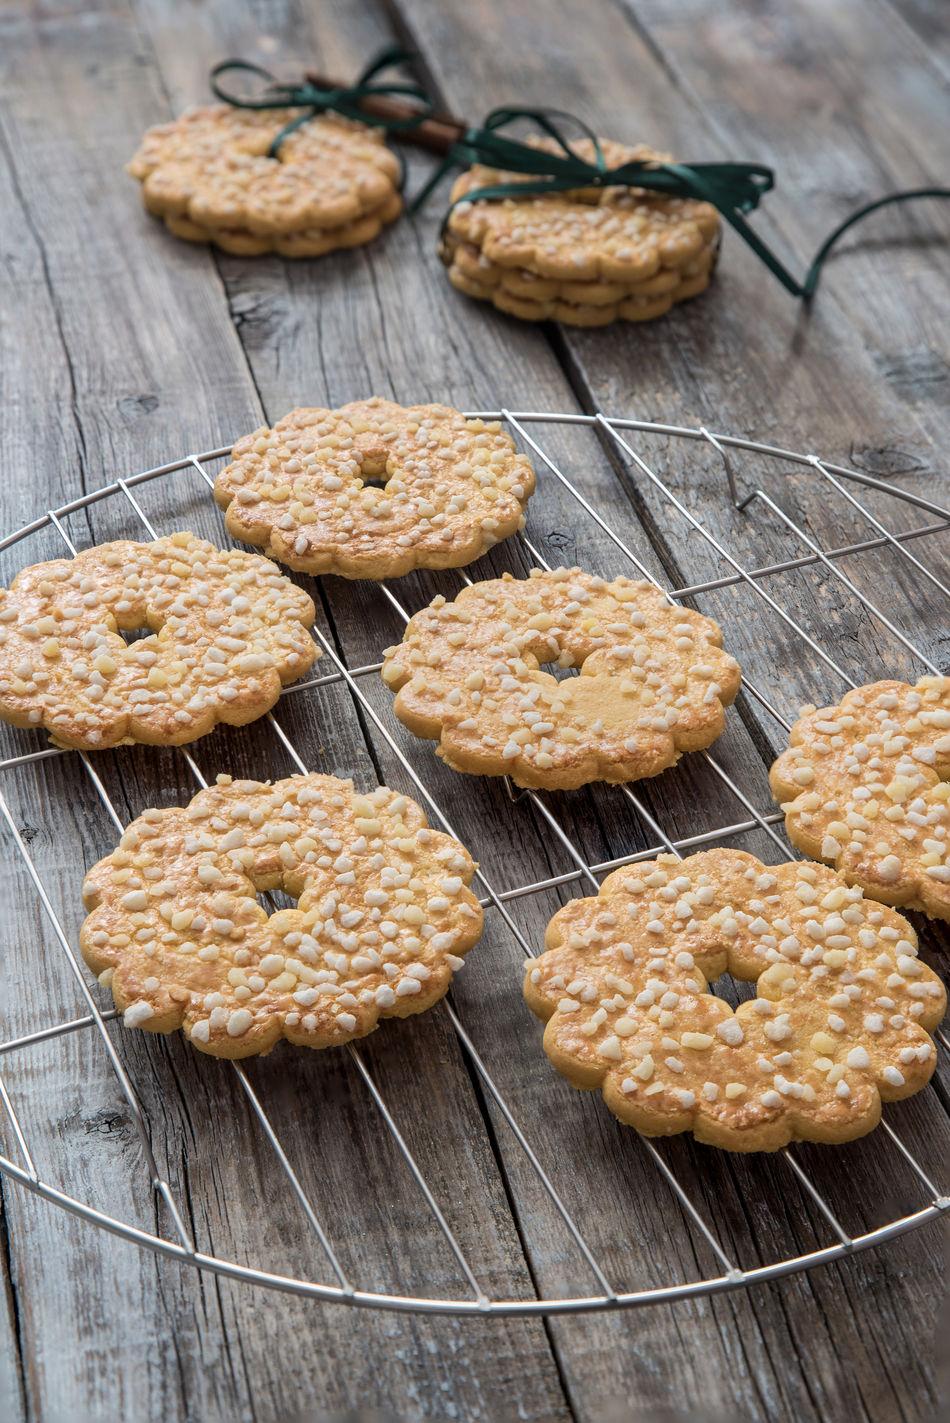 Beautiful stock photos of cookies,  Celebration,  Christmas,  Close-Up,  Cookie